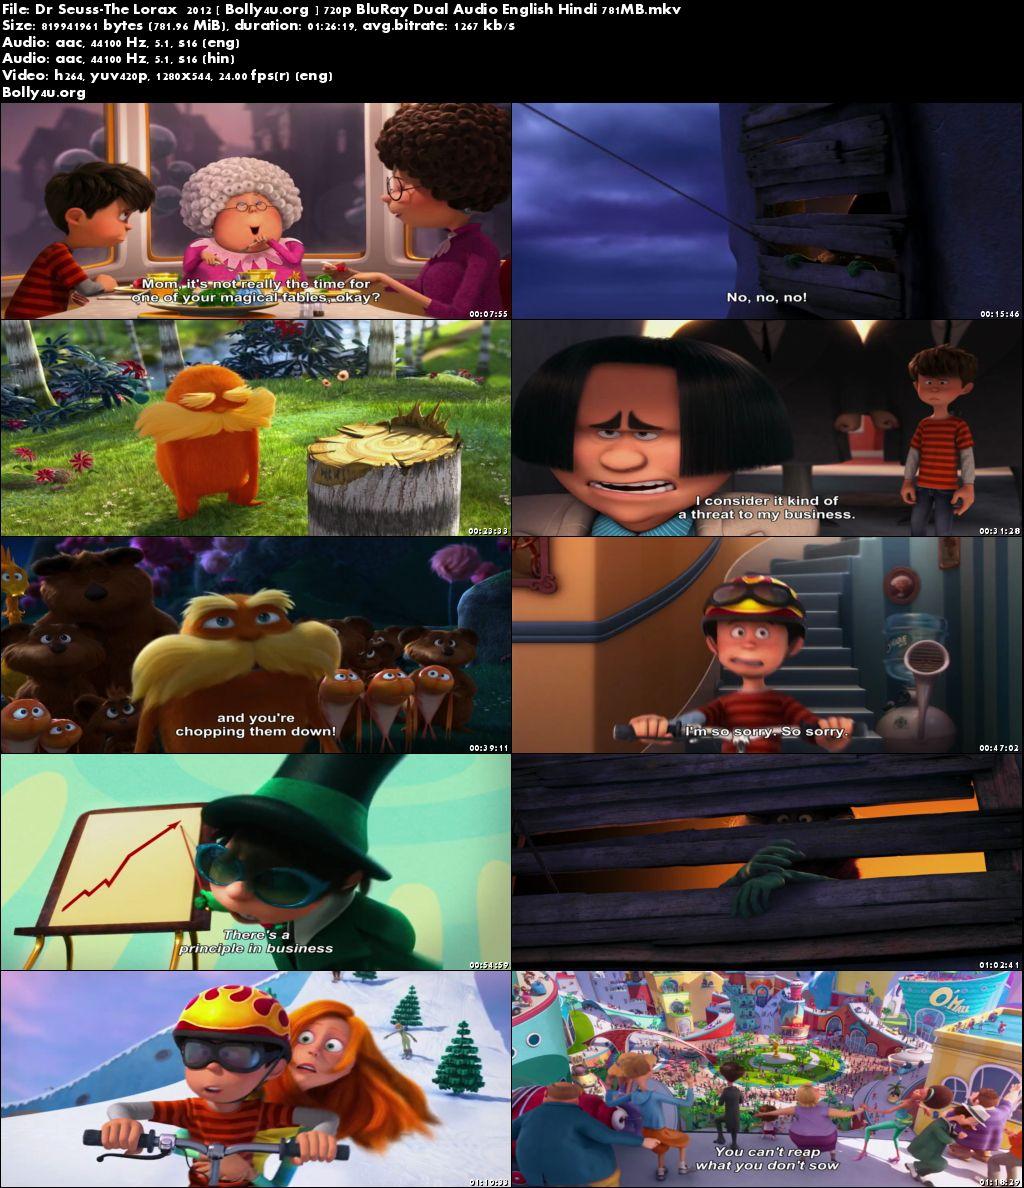 Dr Seuss The Lorax 2012 BluRay 280Mb Hindi Dual Audio 480p